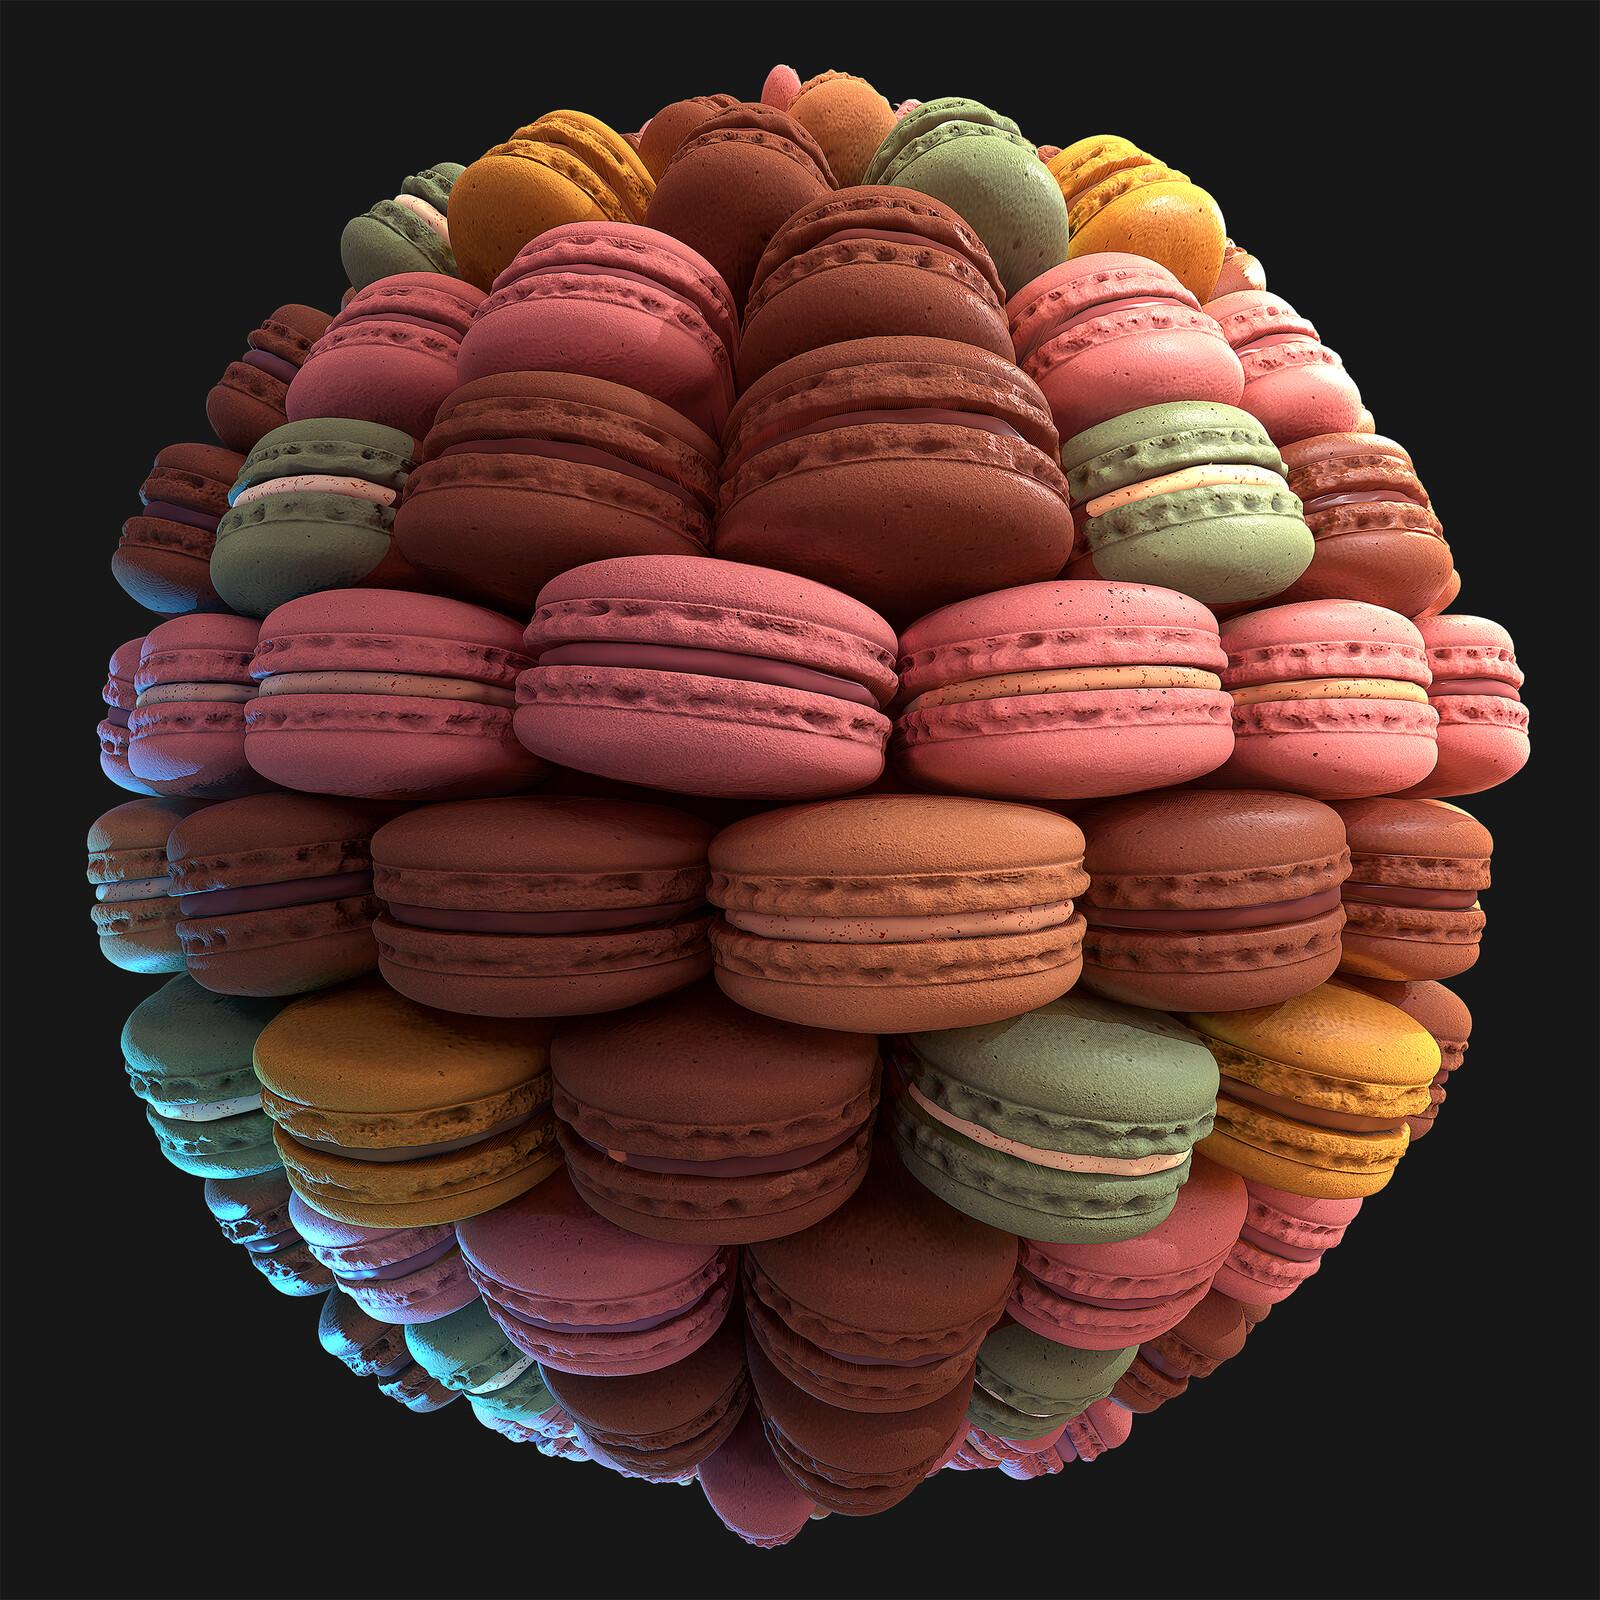 Macaron Material